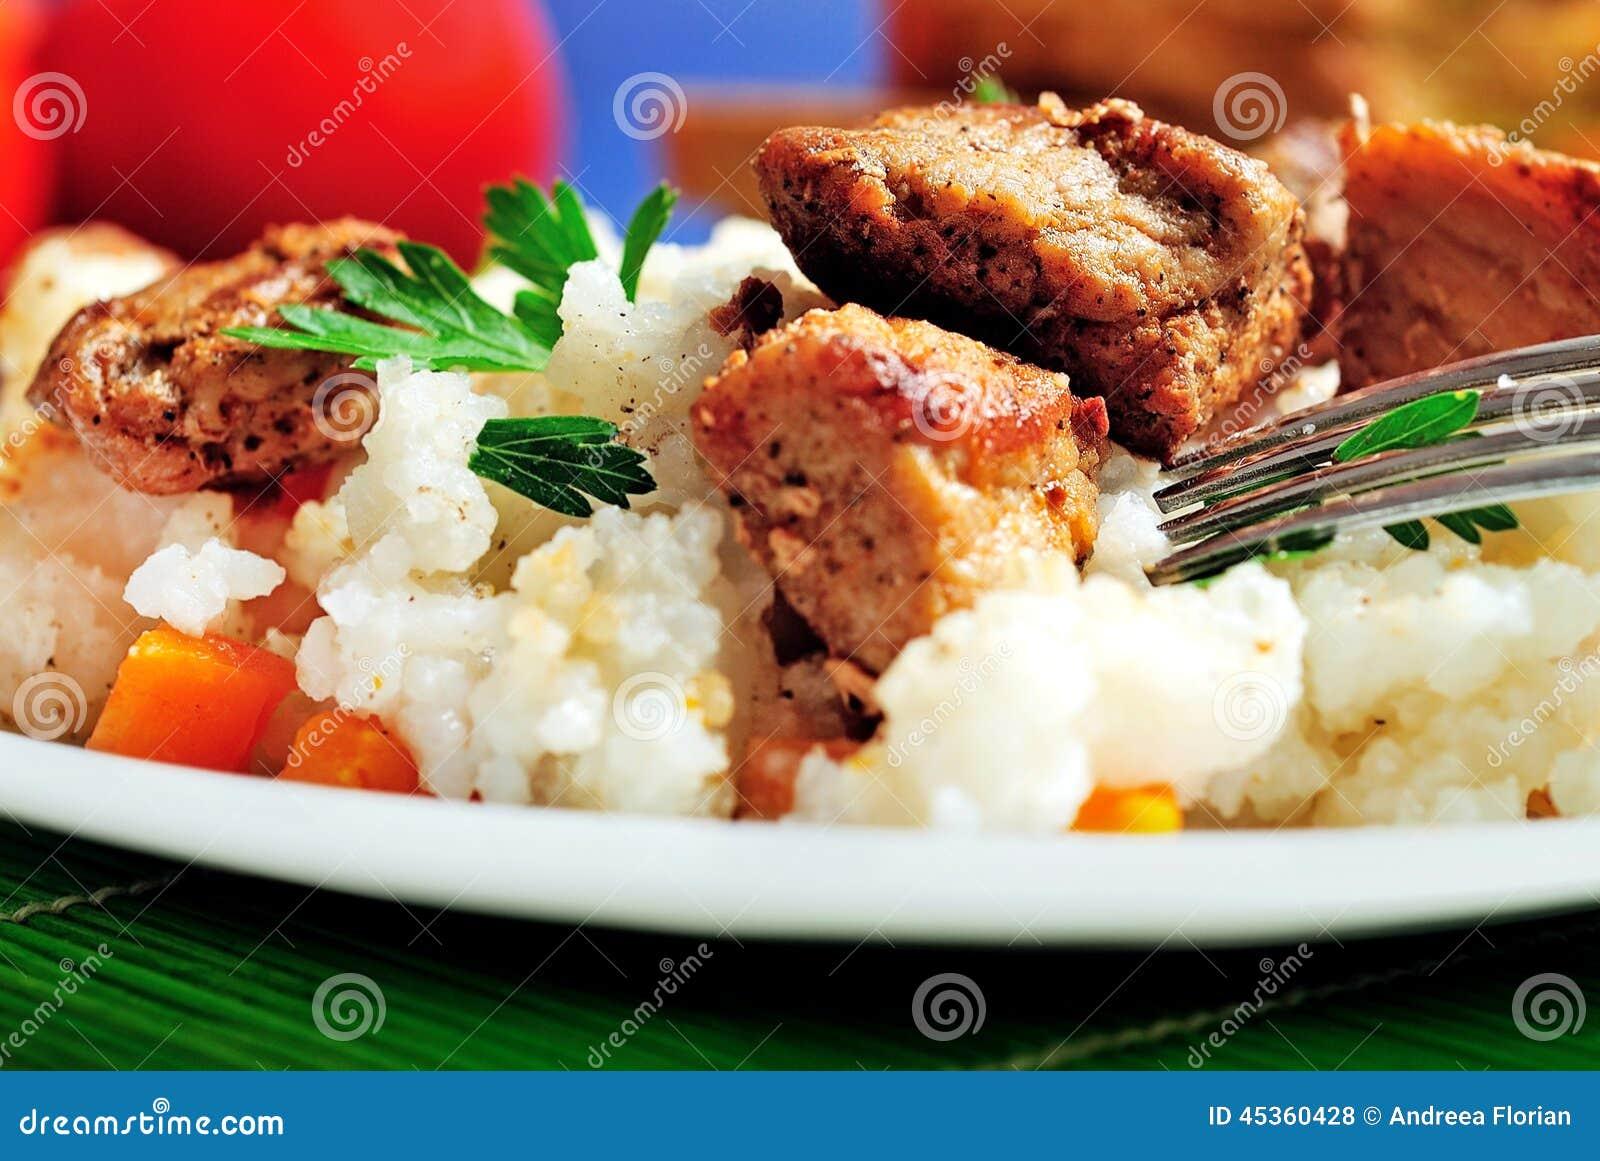 Risotto met vlees